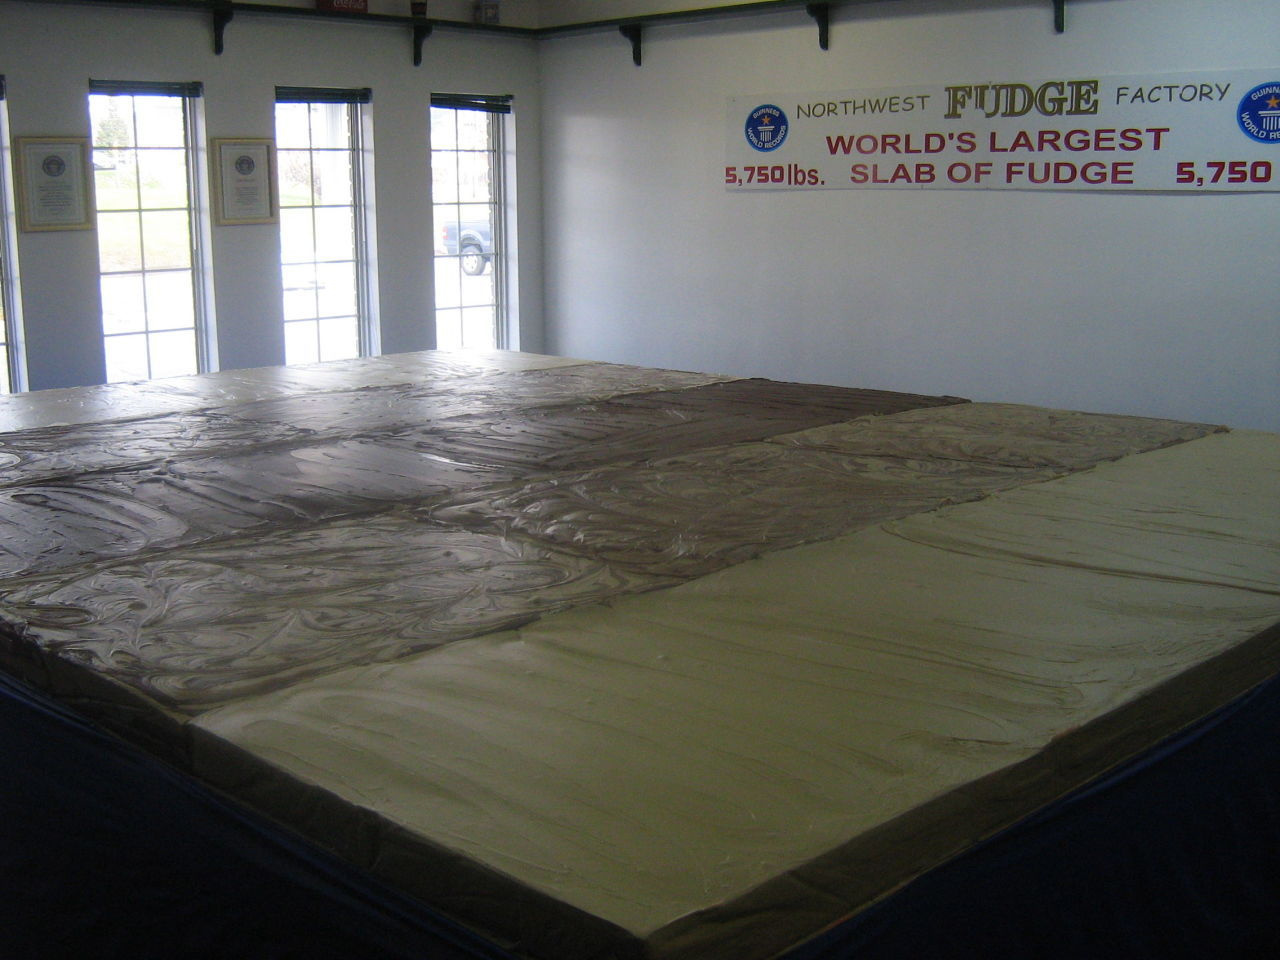 gallery-1433787541-largest-slab-of-fudge